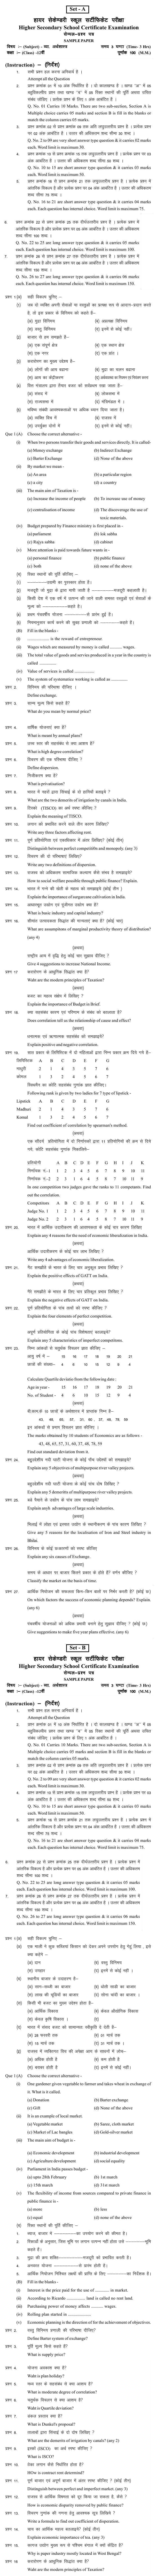 Chattisgarh Board Class 12 Practical Economics and Commerce Geography (Vyavaharik Arthashastra evam vanijyik Bhoogol)Sample Paper